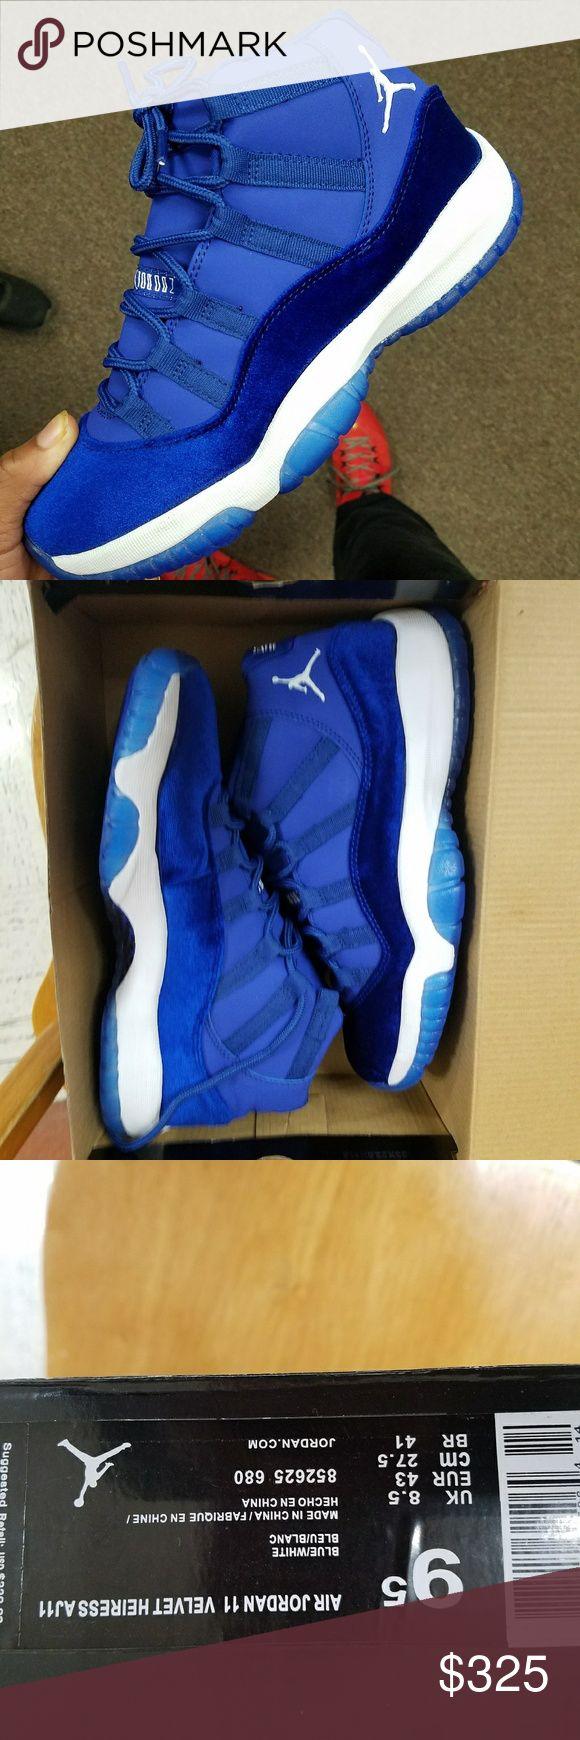 Custom Blue Jordan Heiress 11s Brand new. Never been worn. Jordan Shoes Sneakers #WomensFashionTips